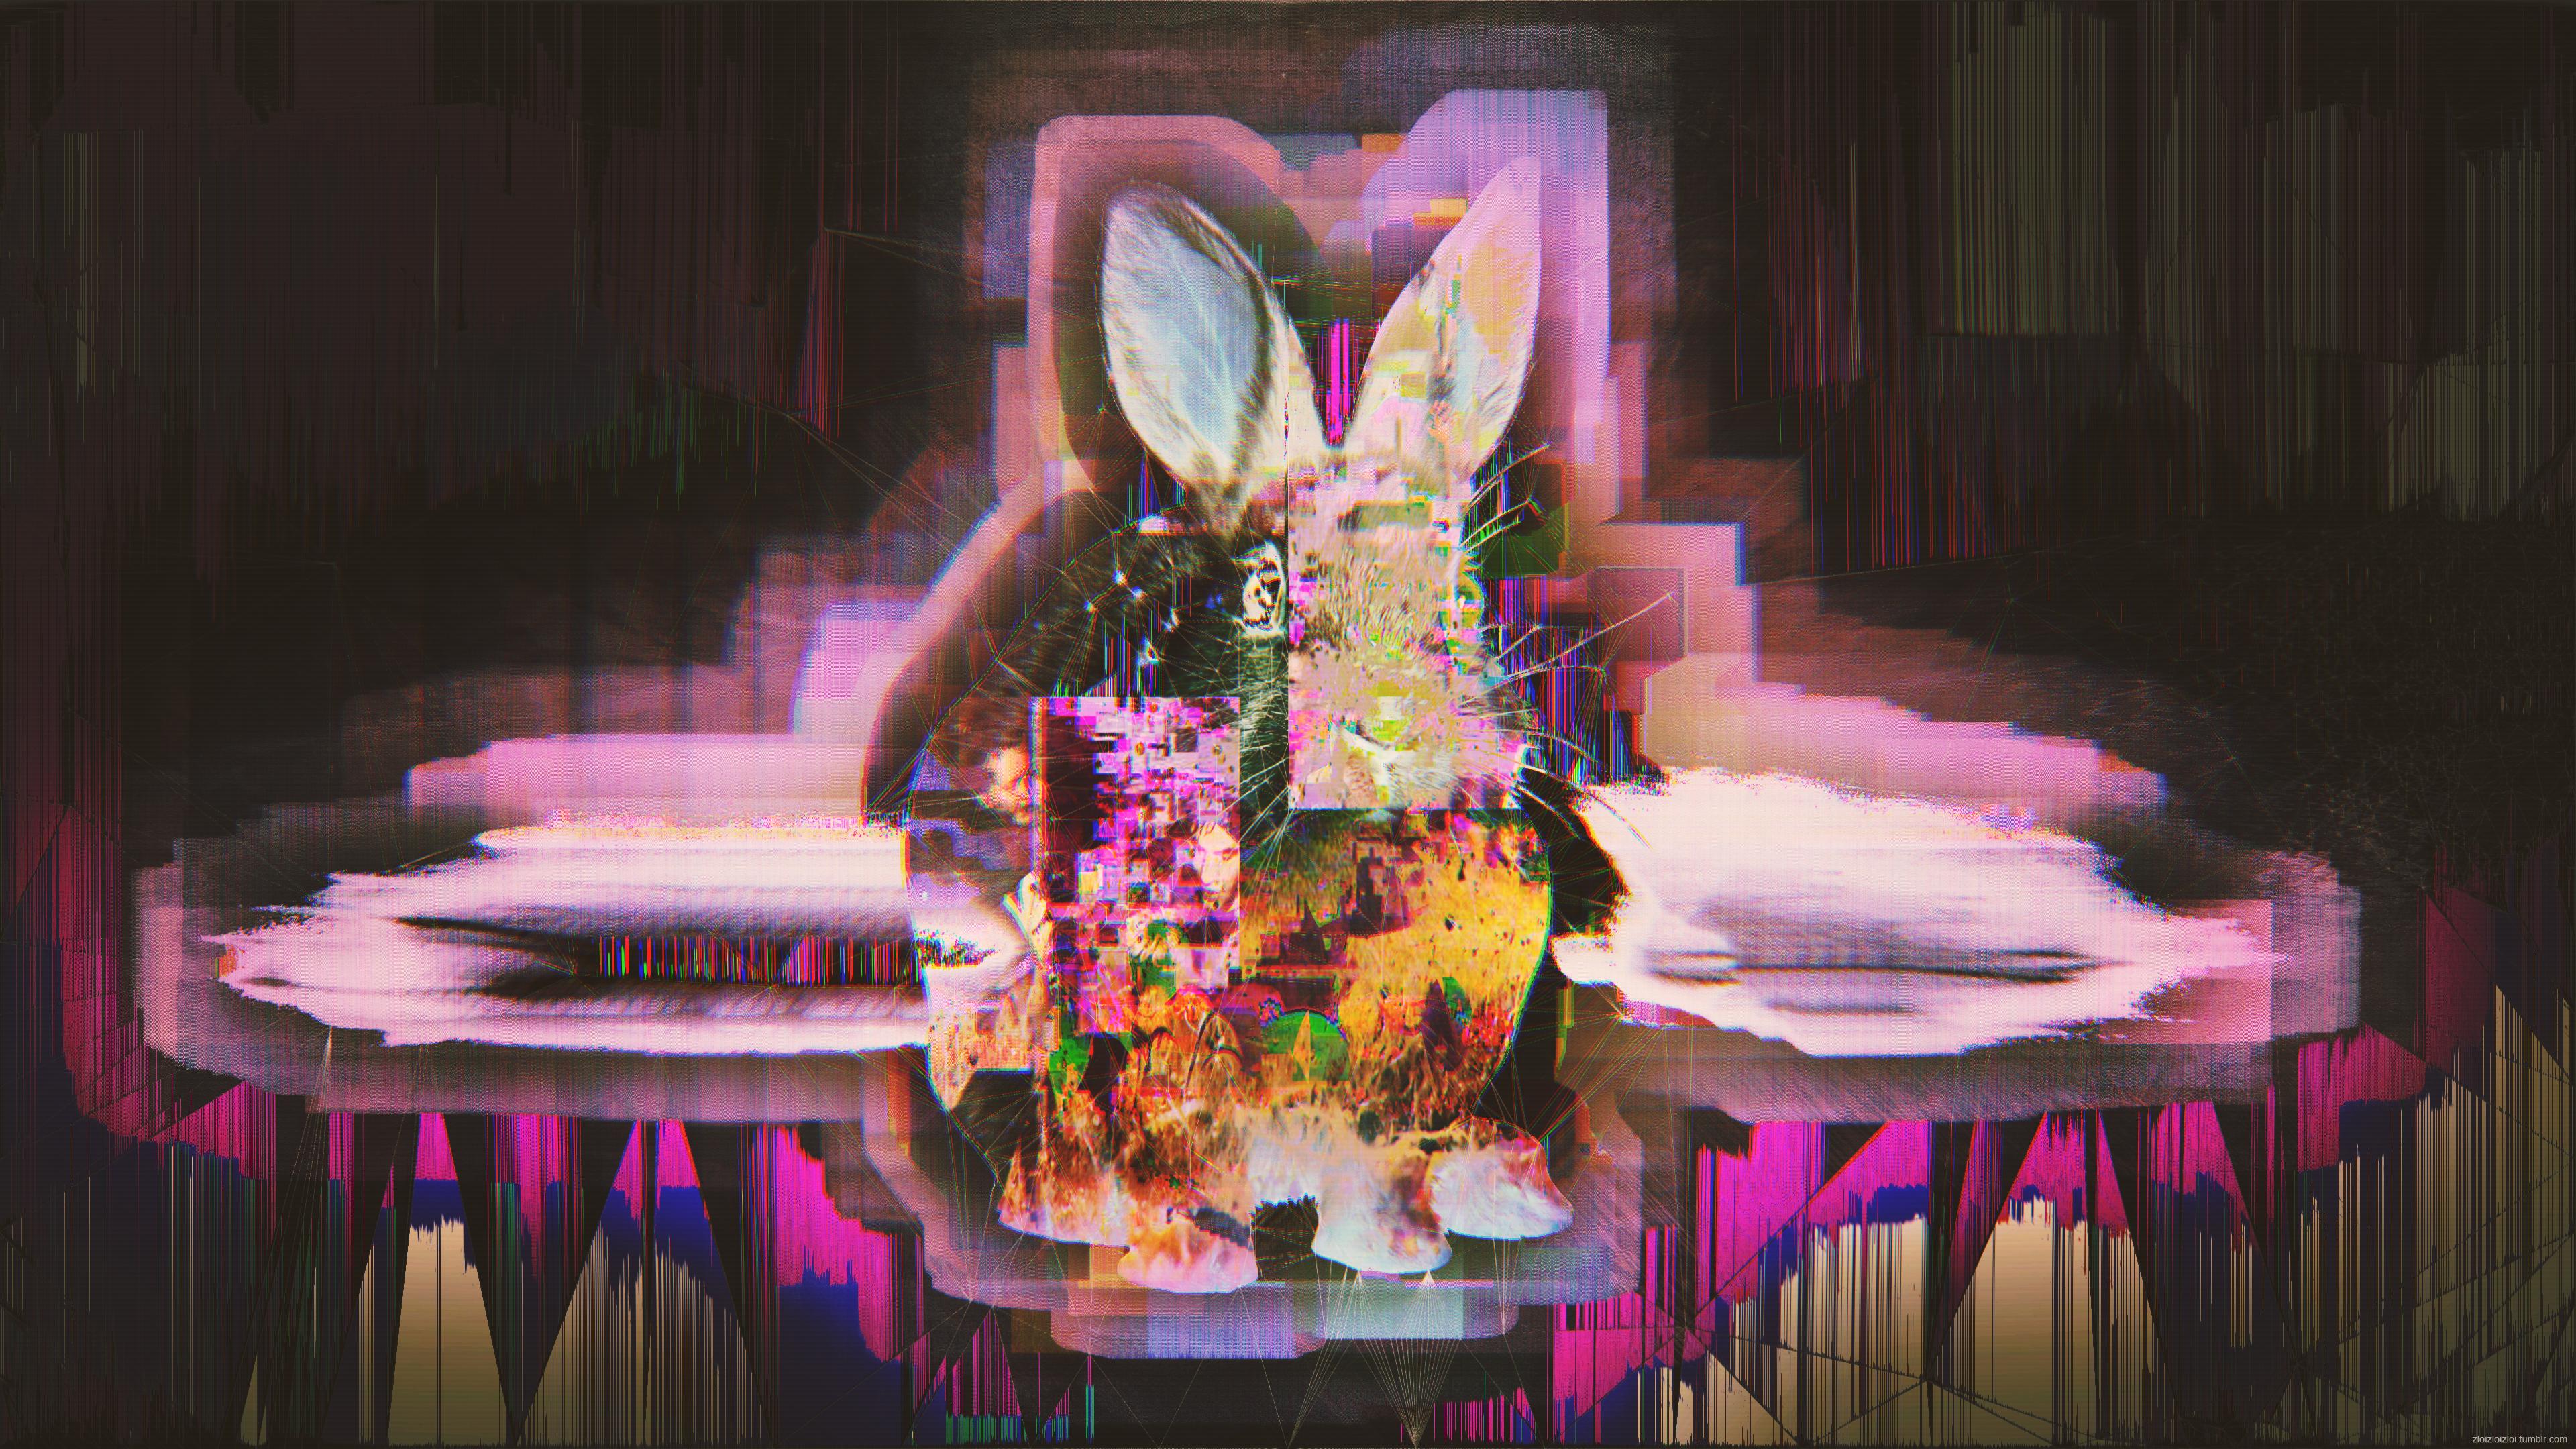 General 3840x2160 glitch art abstract rabbits